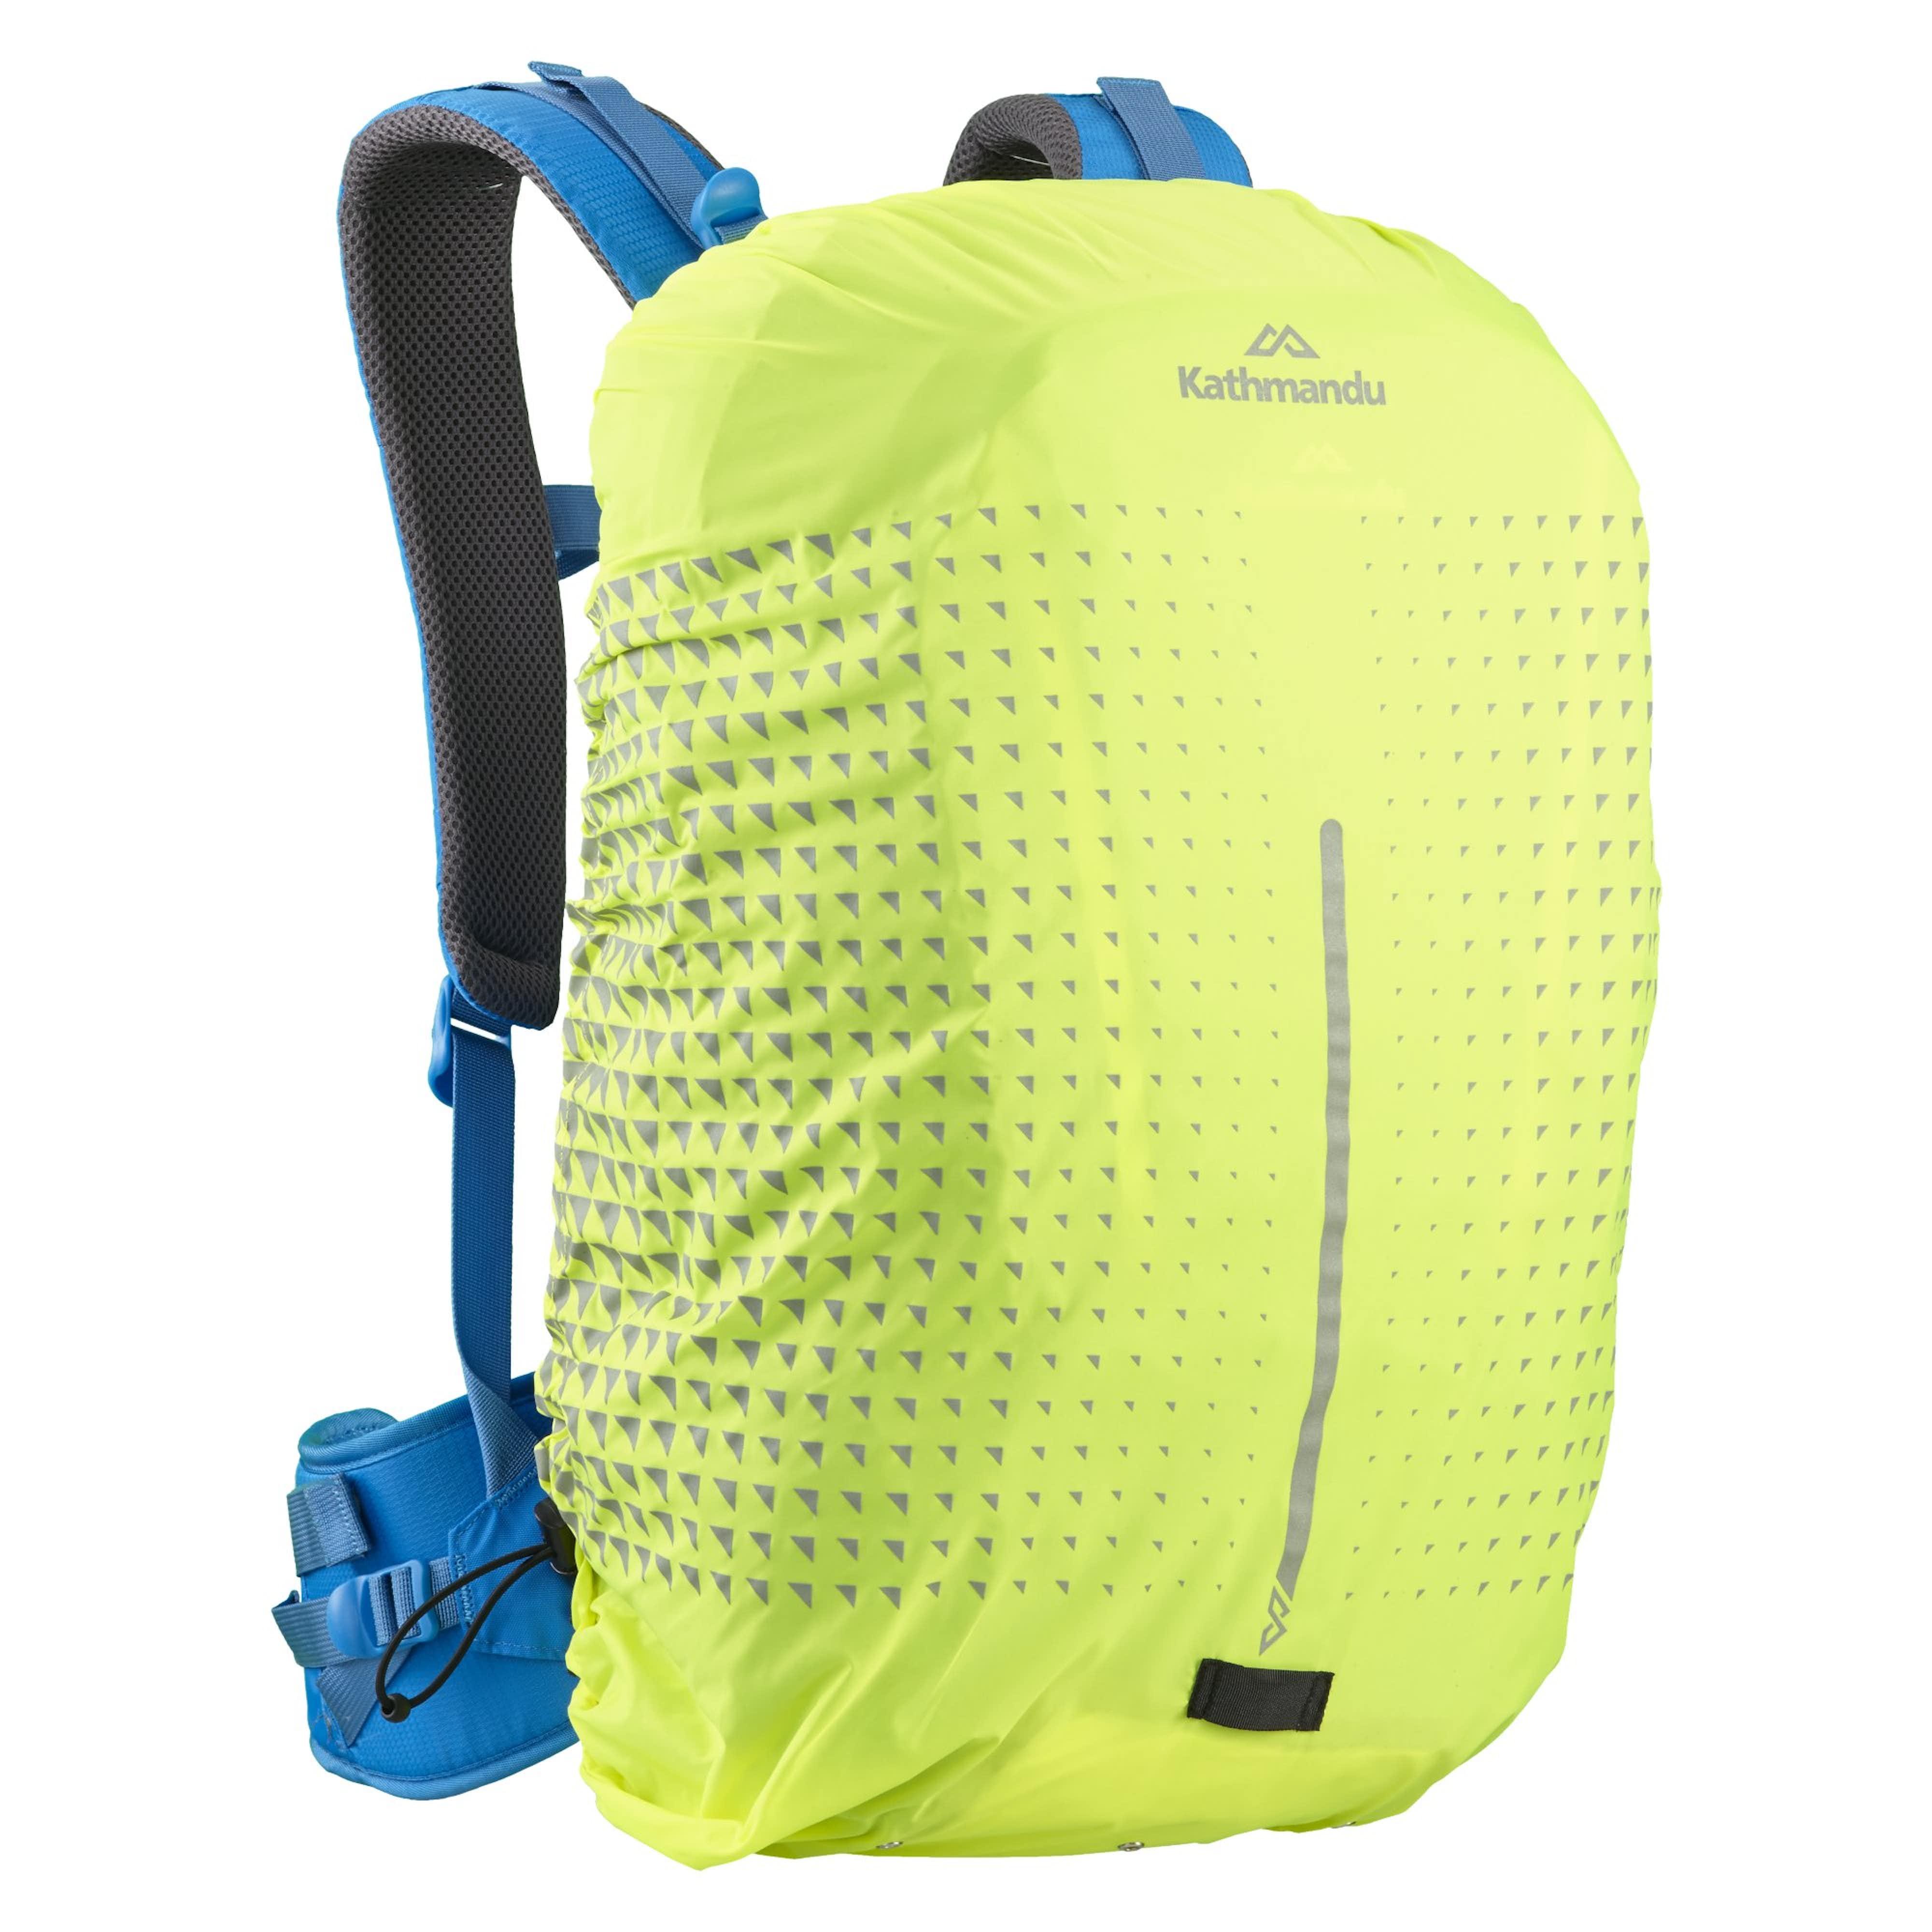 cb972f46155b Commute Pack Raincover - Small